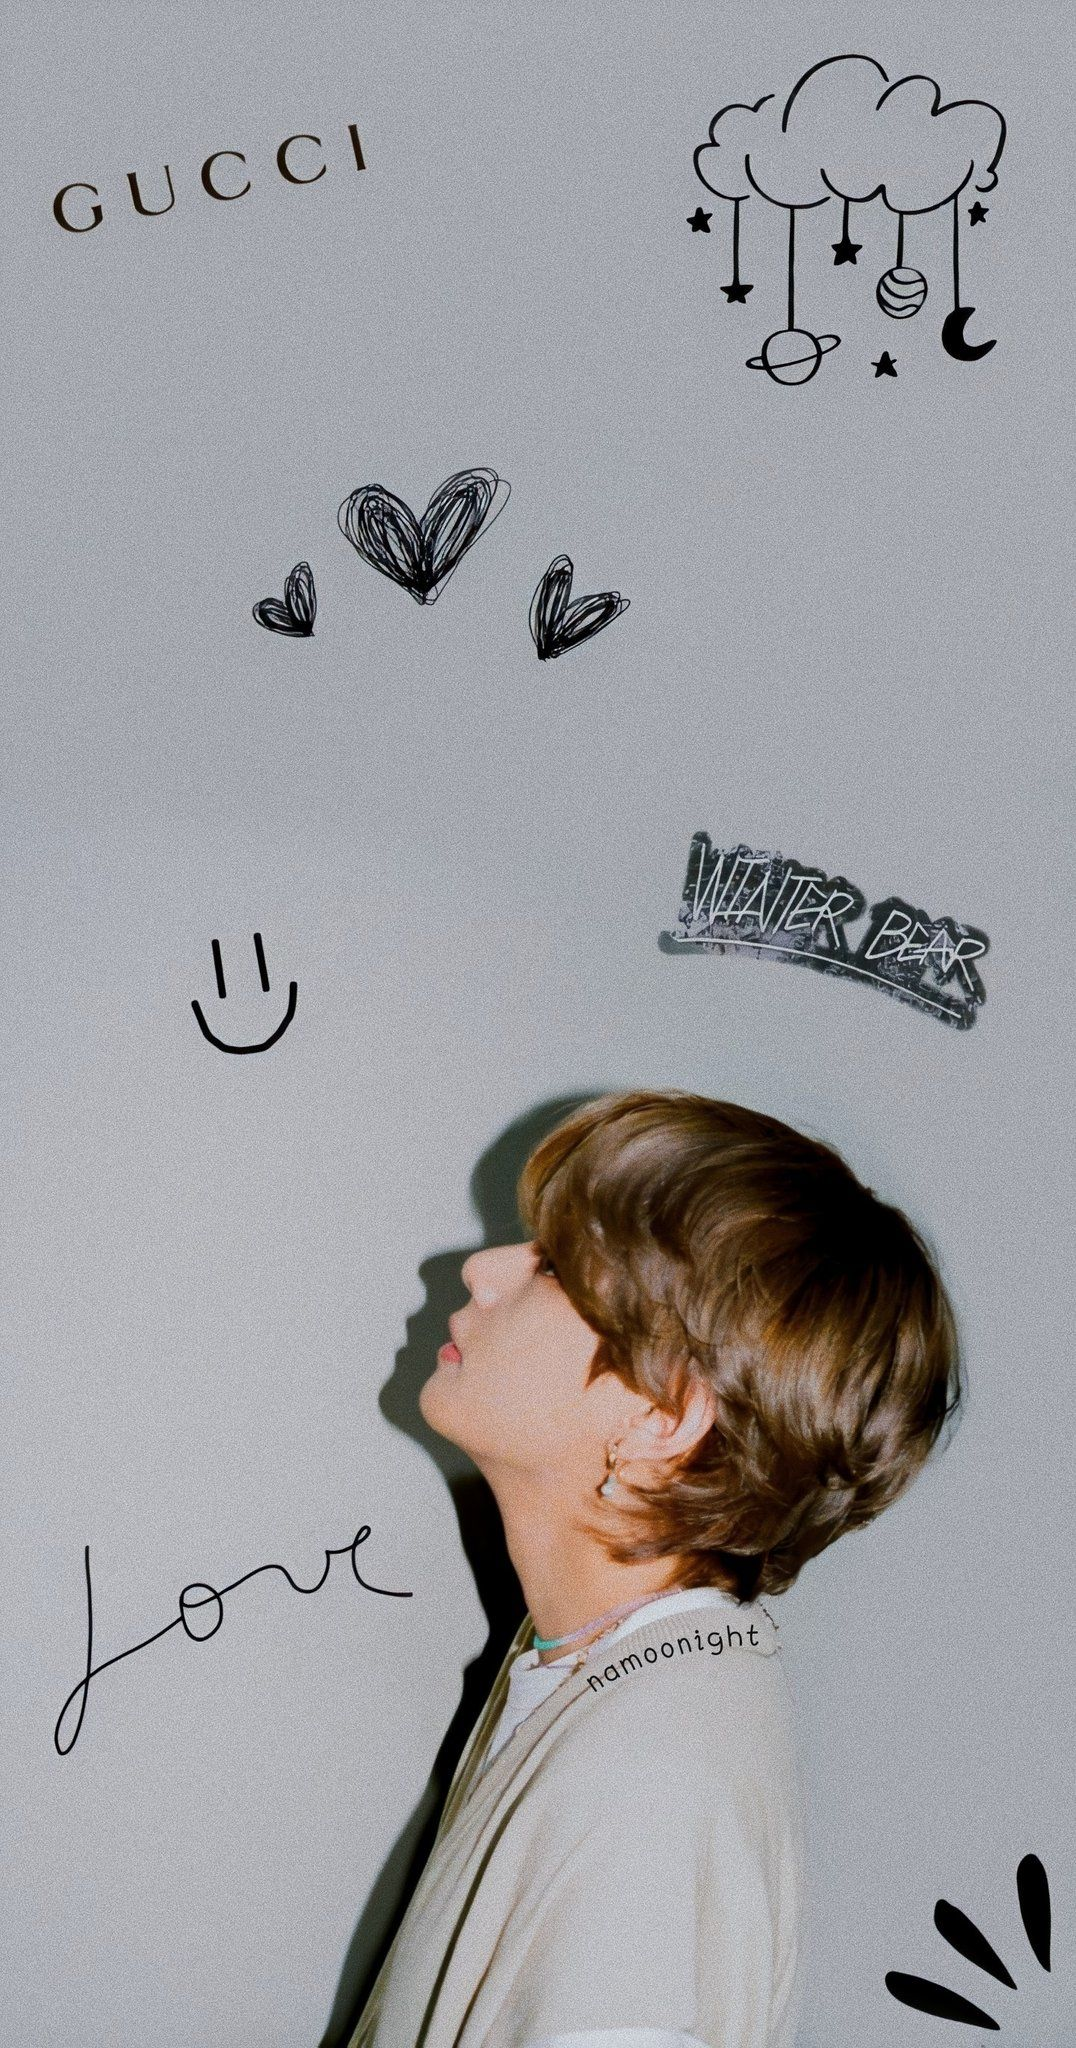 Eci On Twitter Tato Kecil Lucu Wallpaper Lucu Gambar Lucu Bts taehyung aesthetic wallpaper